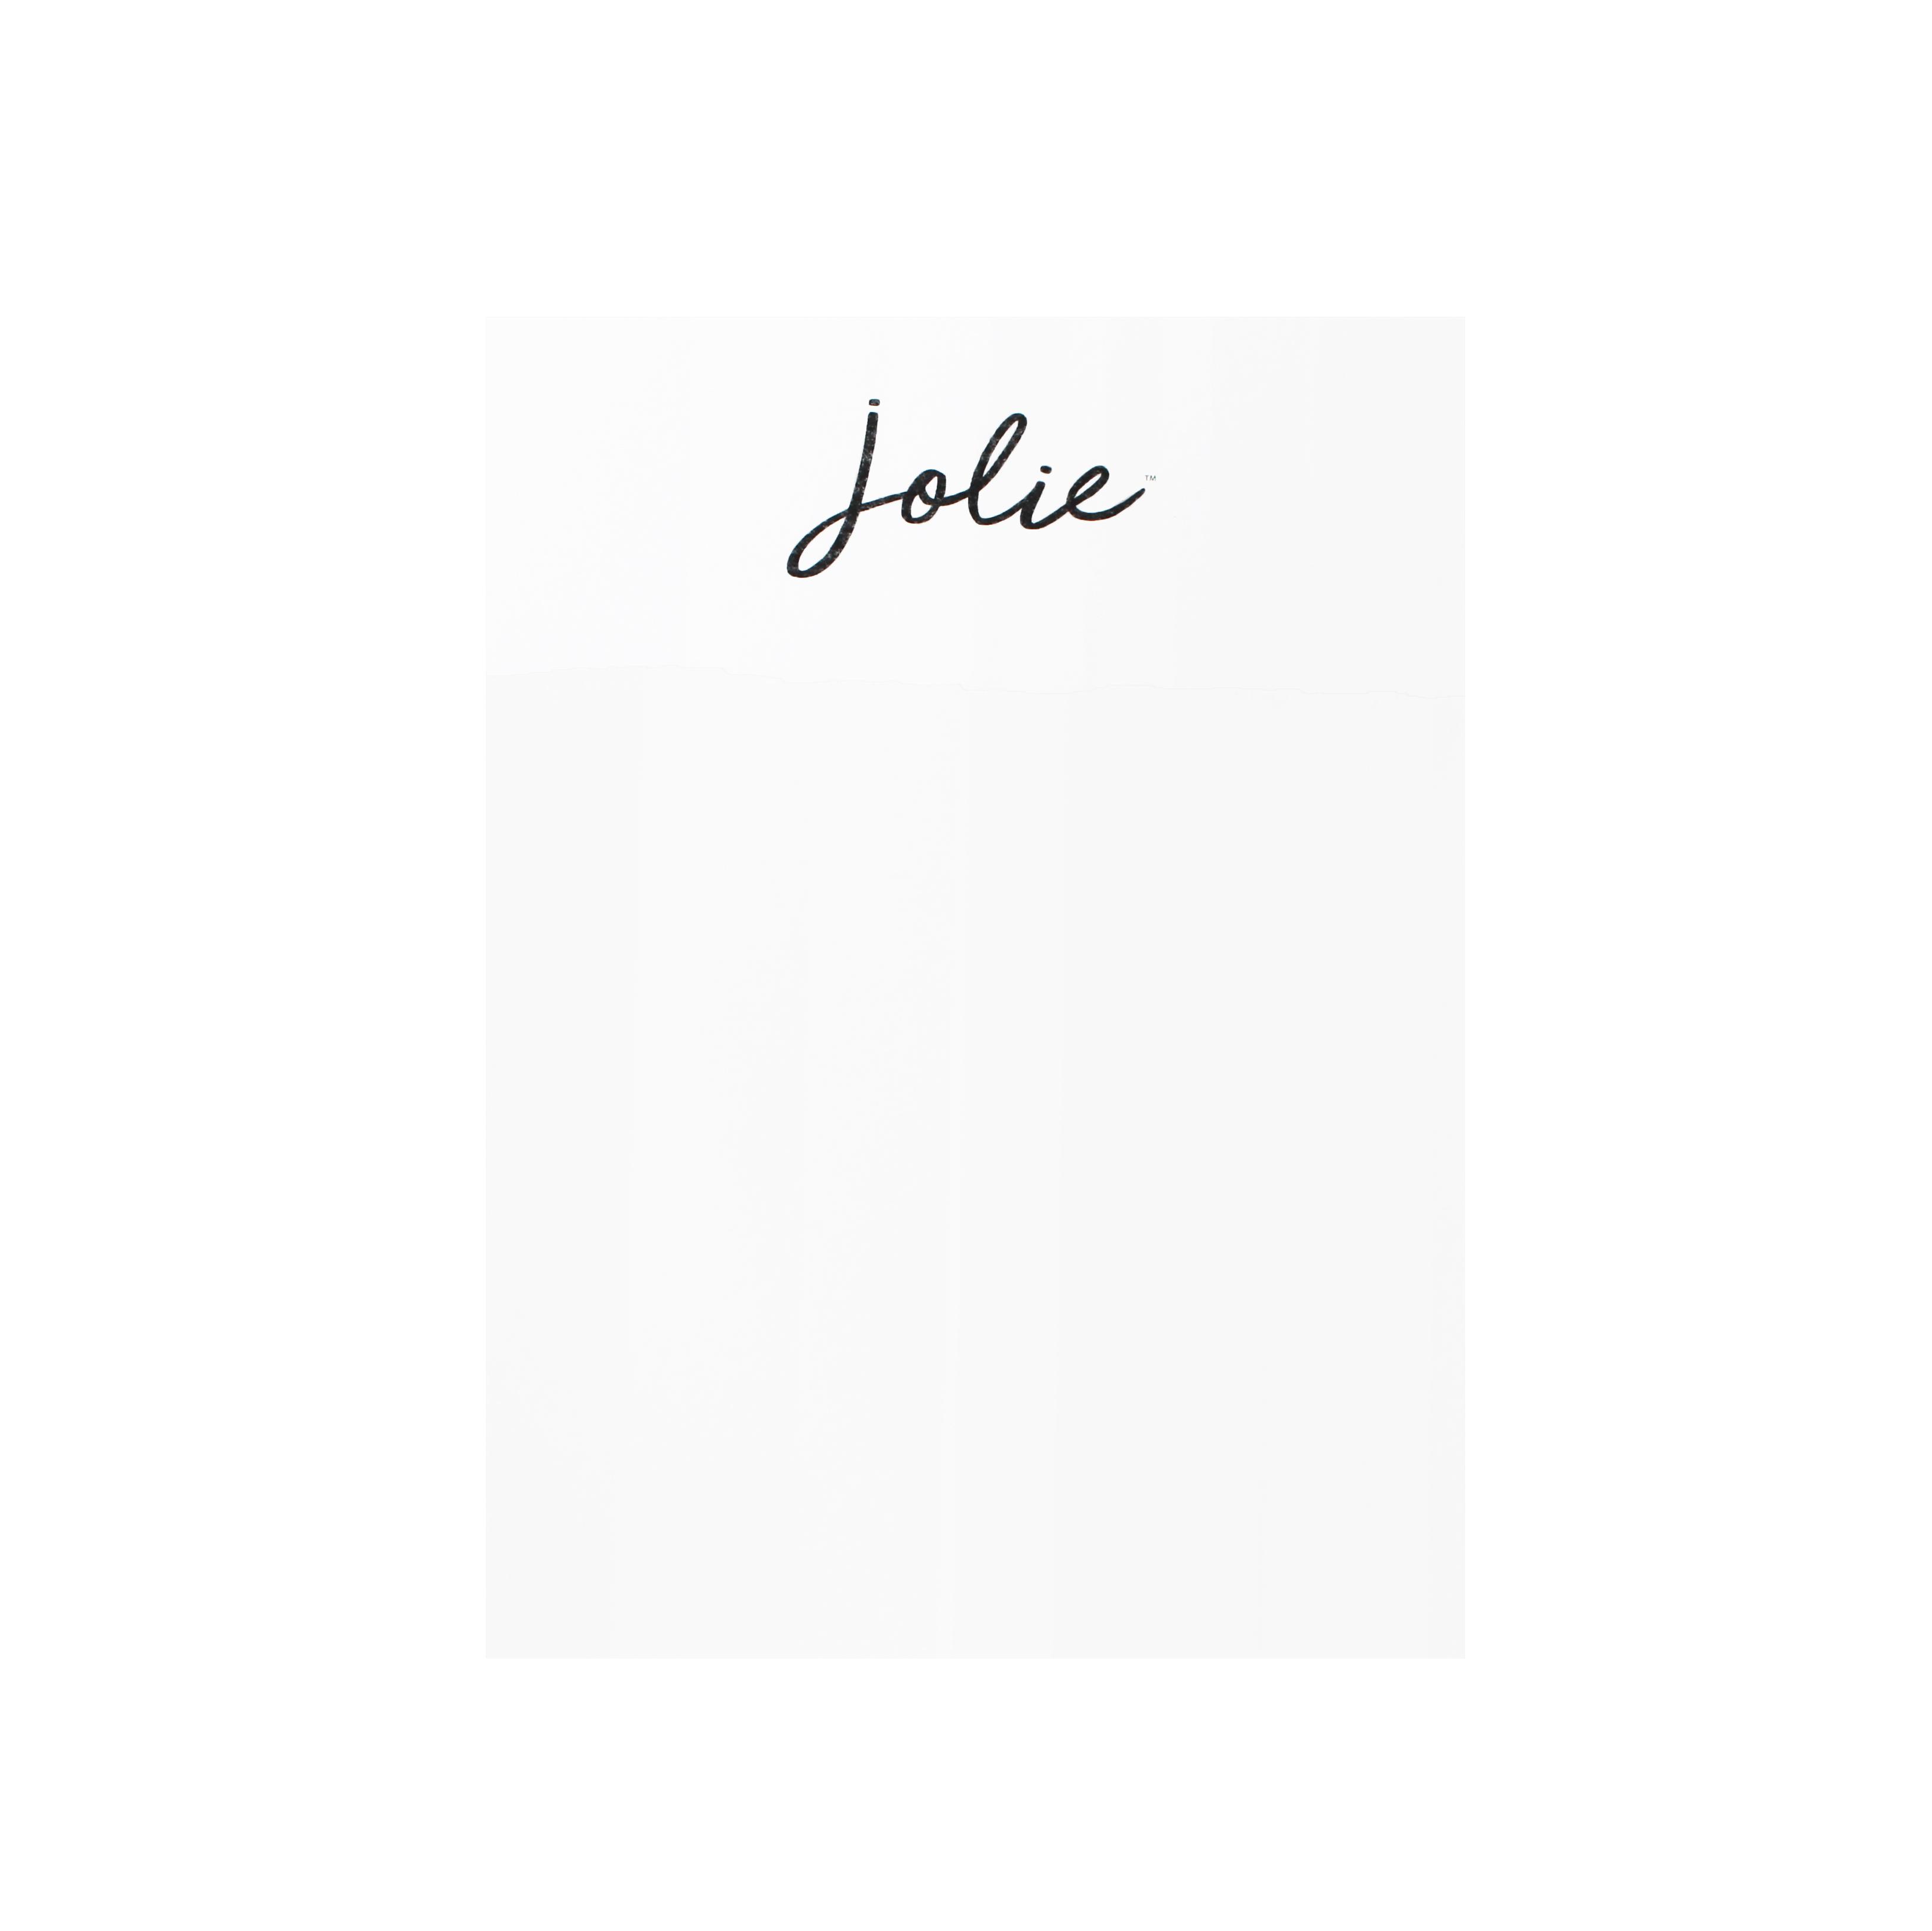 Palace White- Jolie Paint (s)